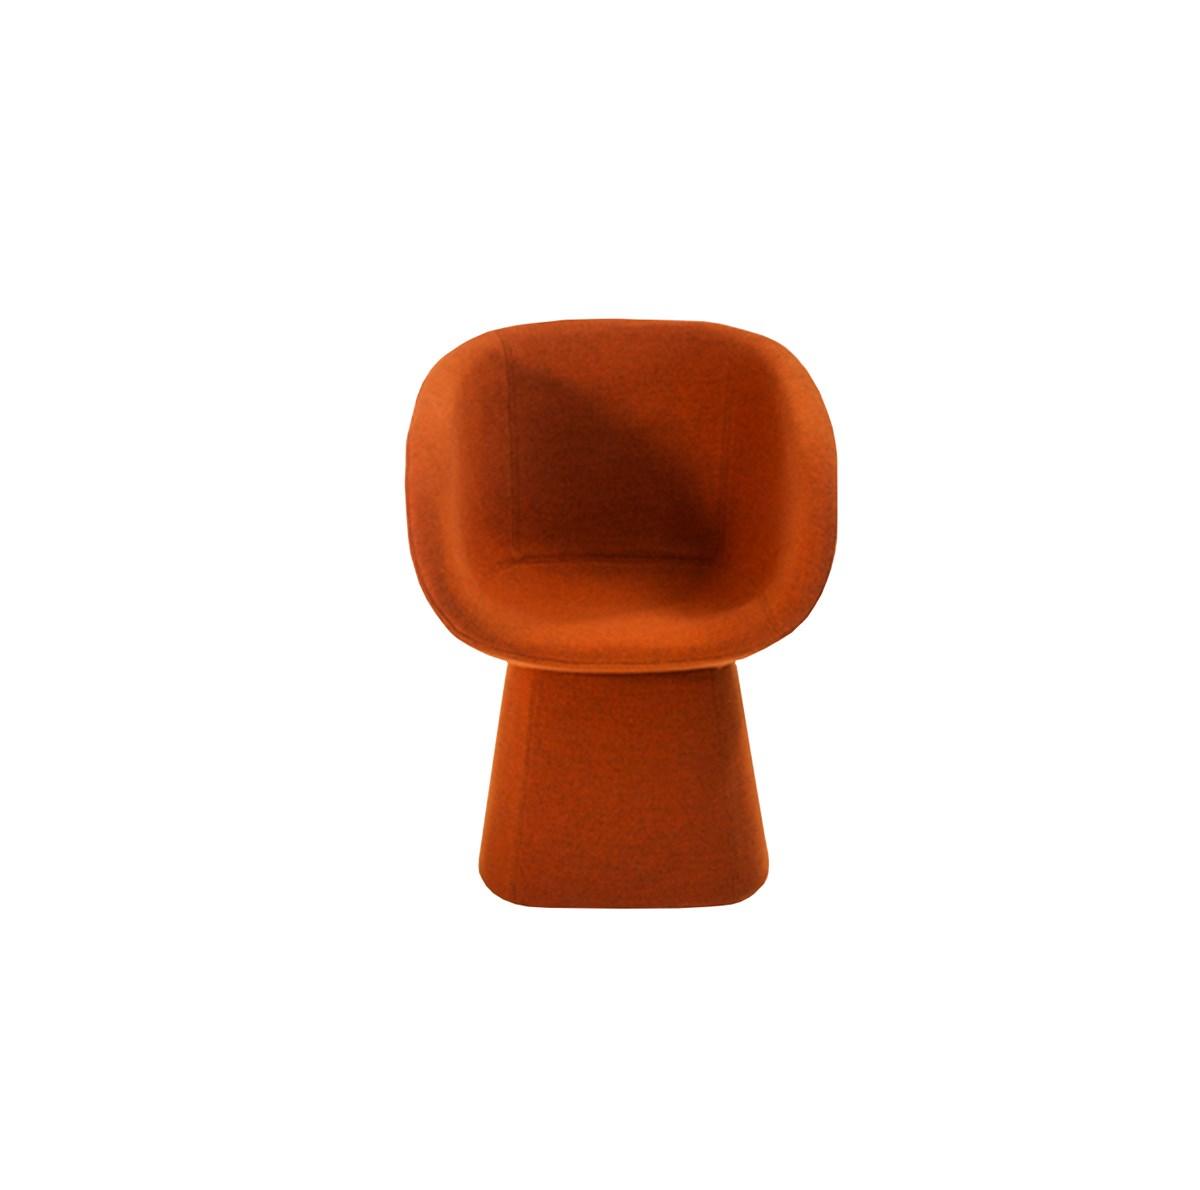 Moroso-Nipa-Doshi-Jonathan-Levien-Armada-Small-Armchair-Matisse-1